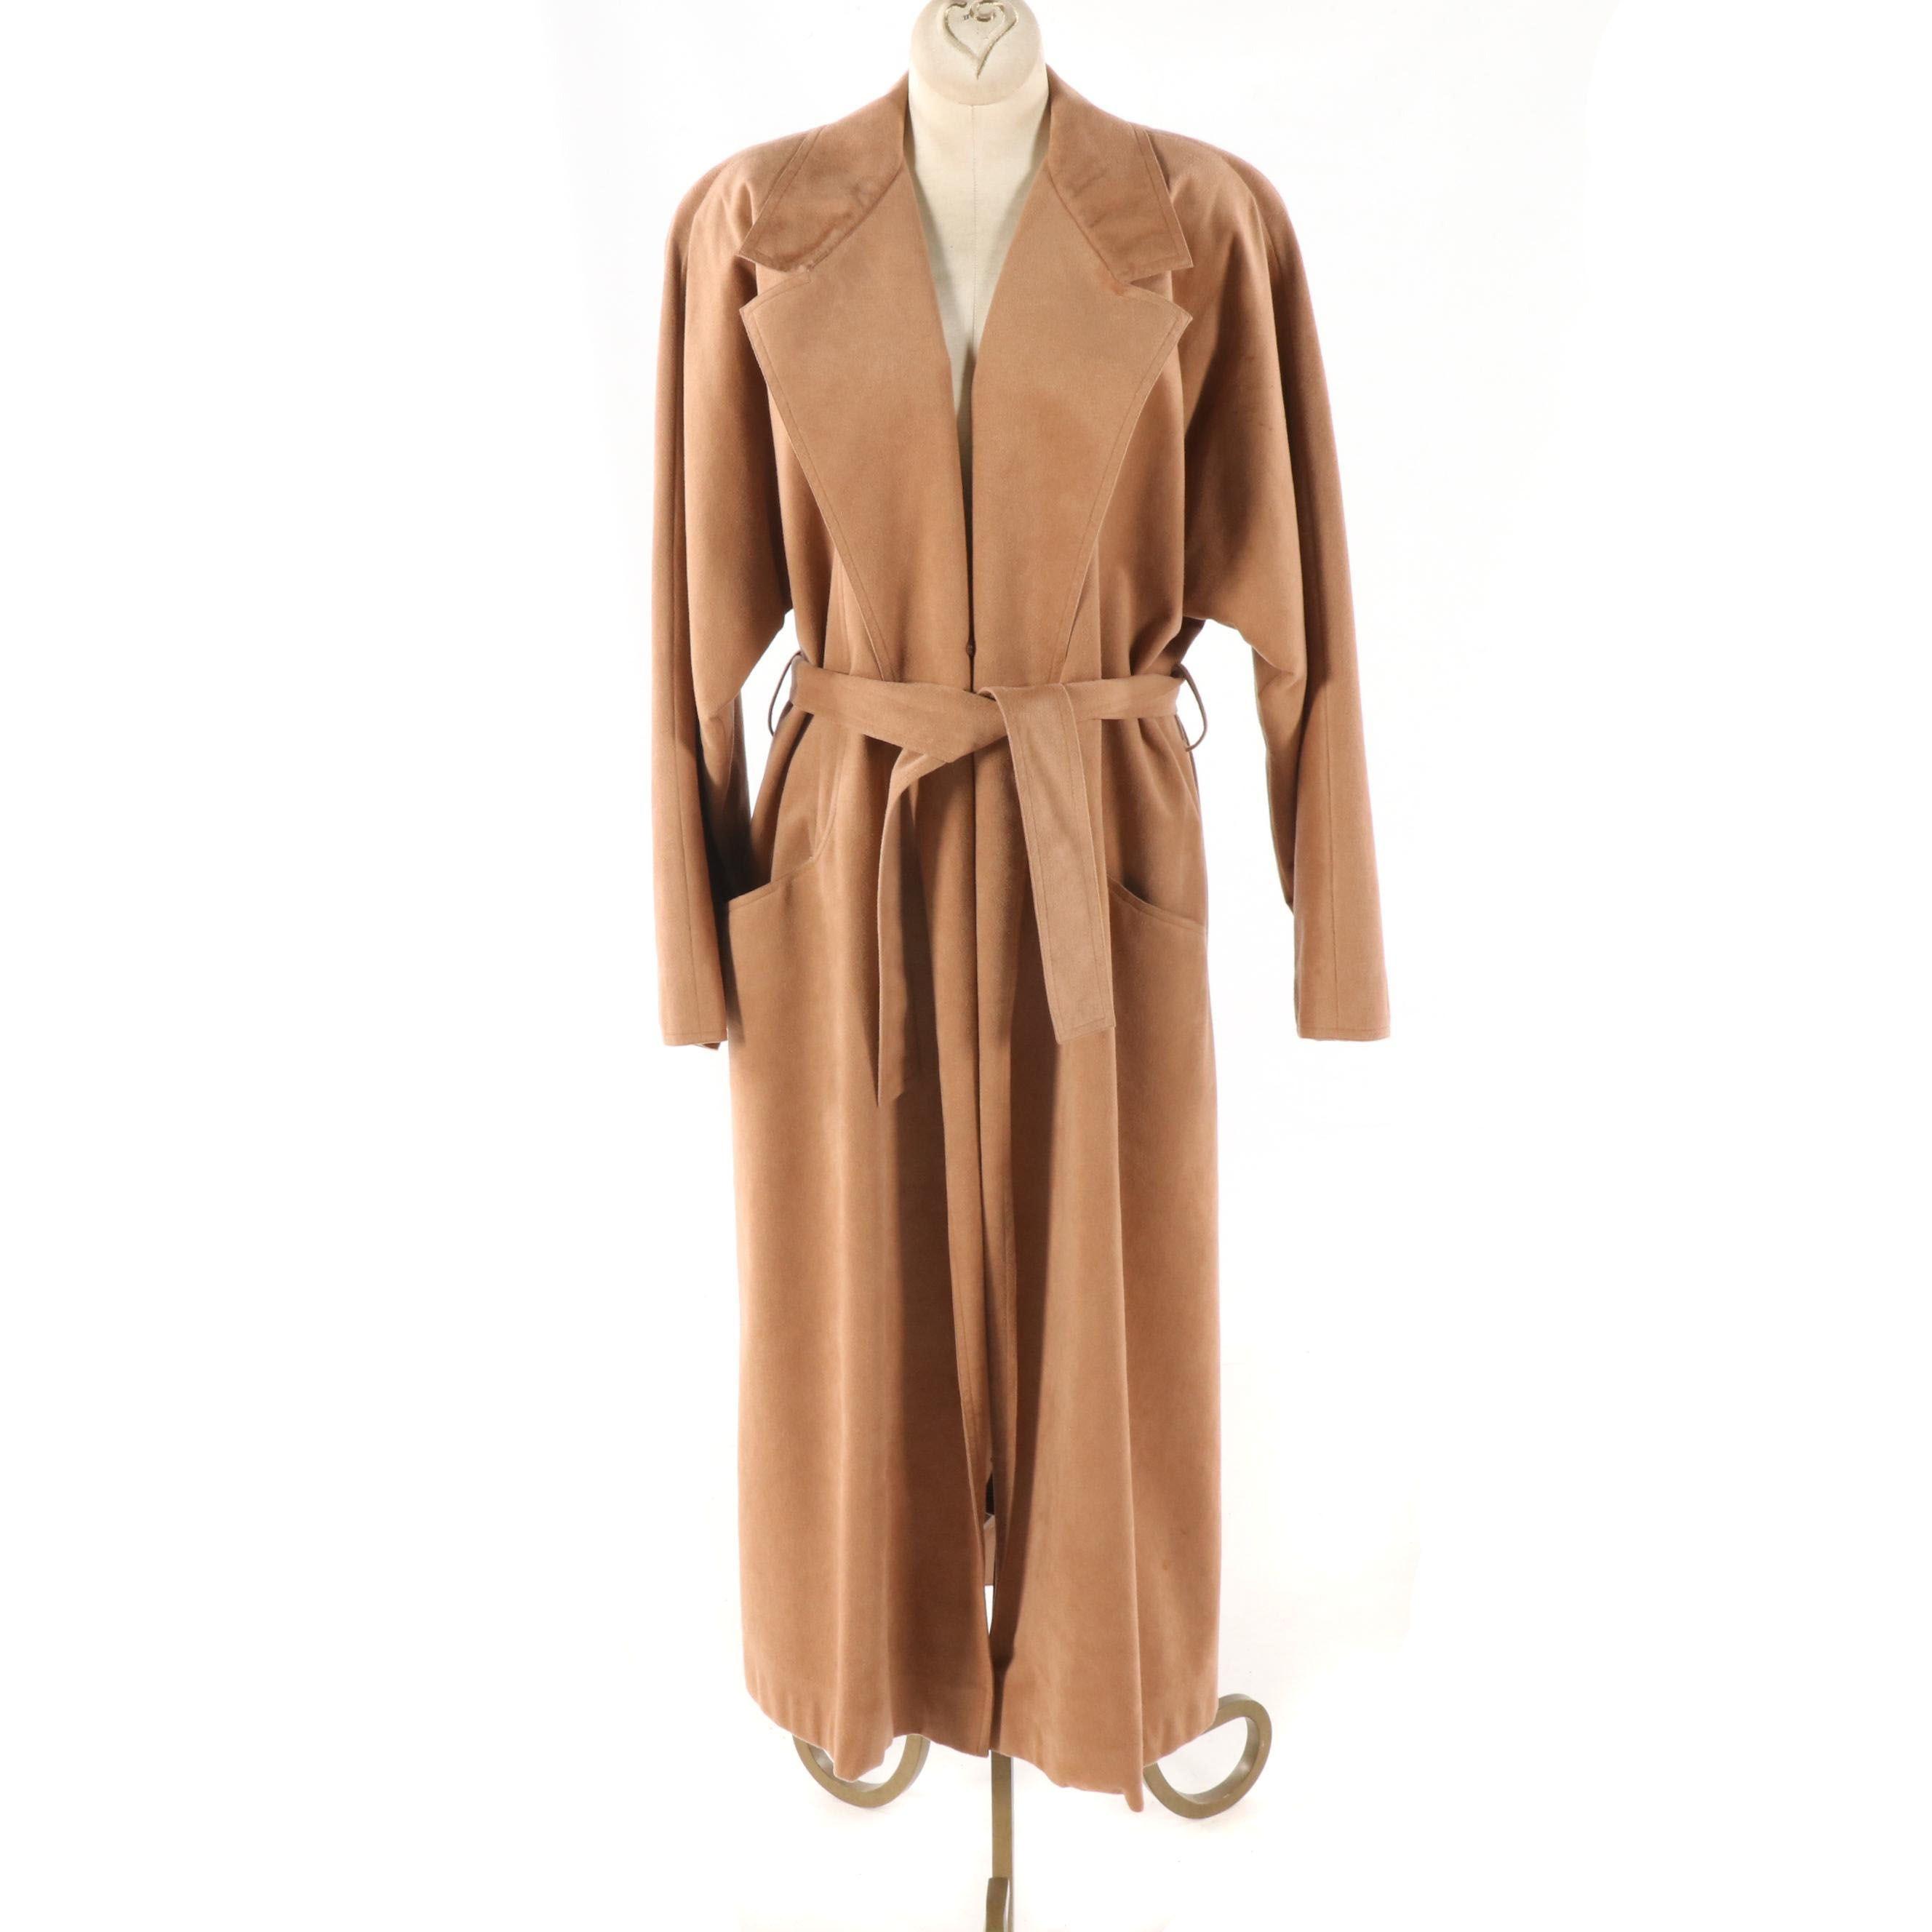 Women's Vintage Ernst Strauss for Montaldo's Tan Ultrasuede Coat with Tie Belt